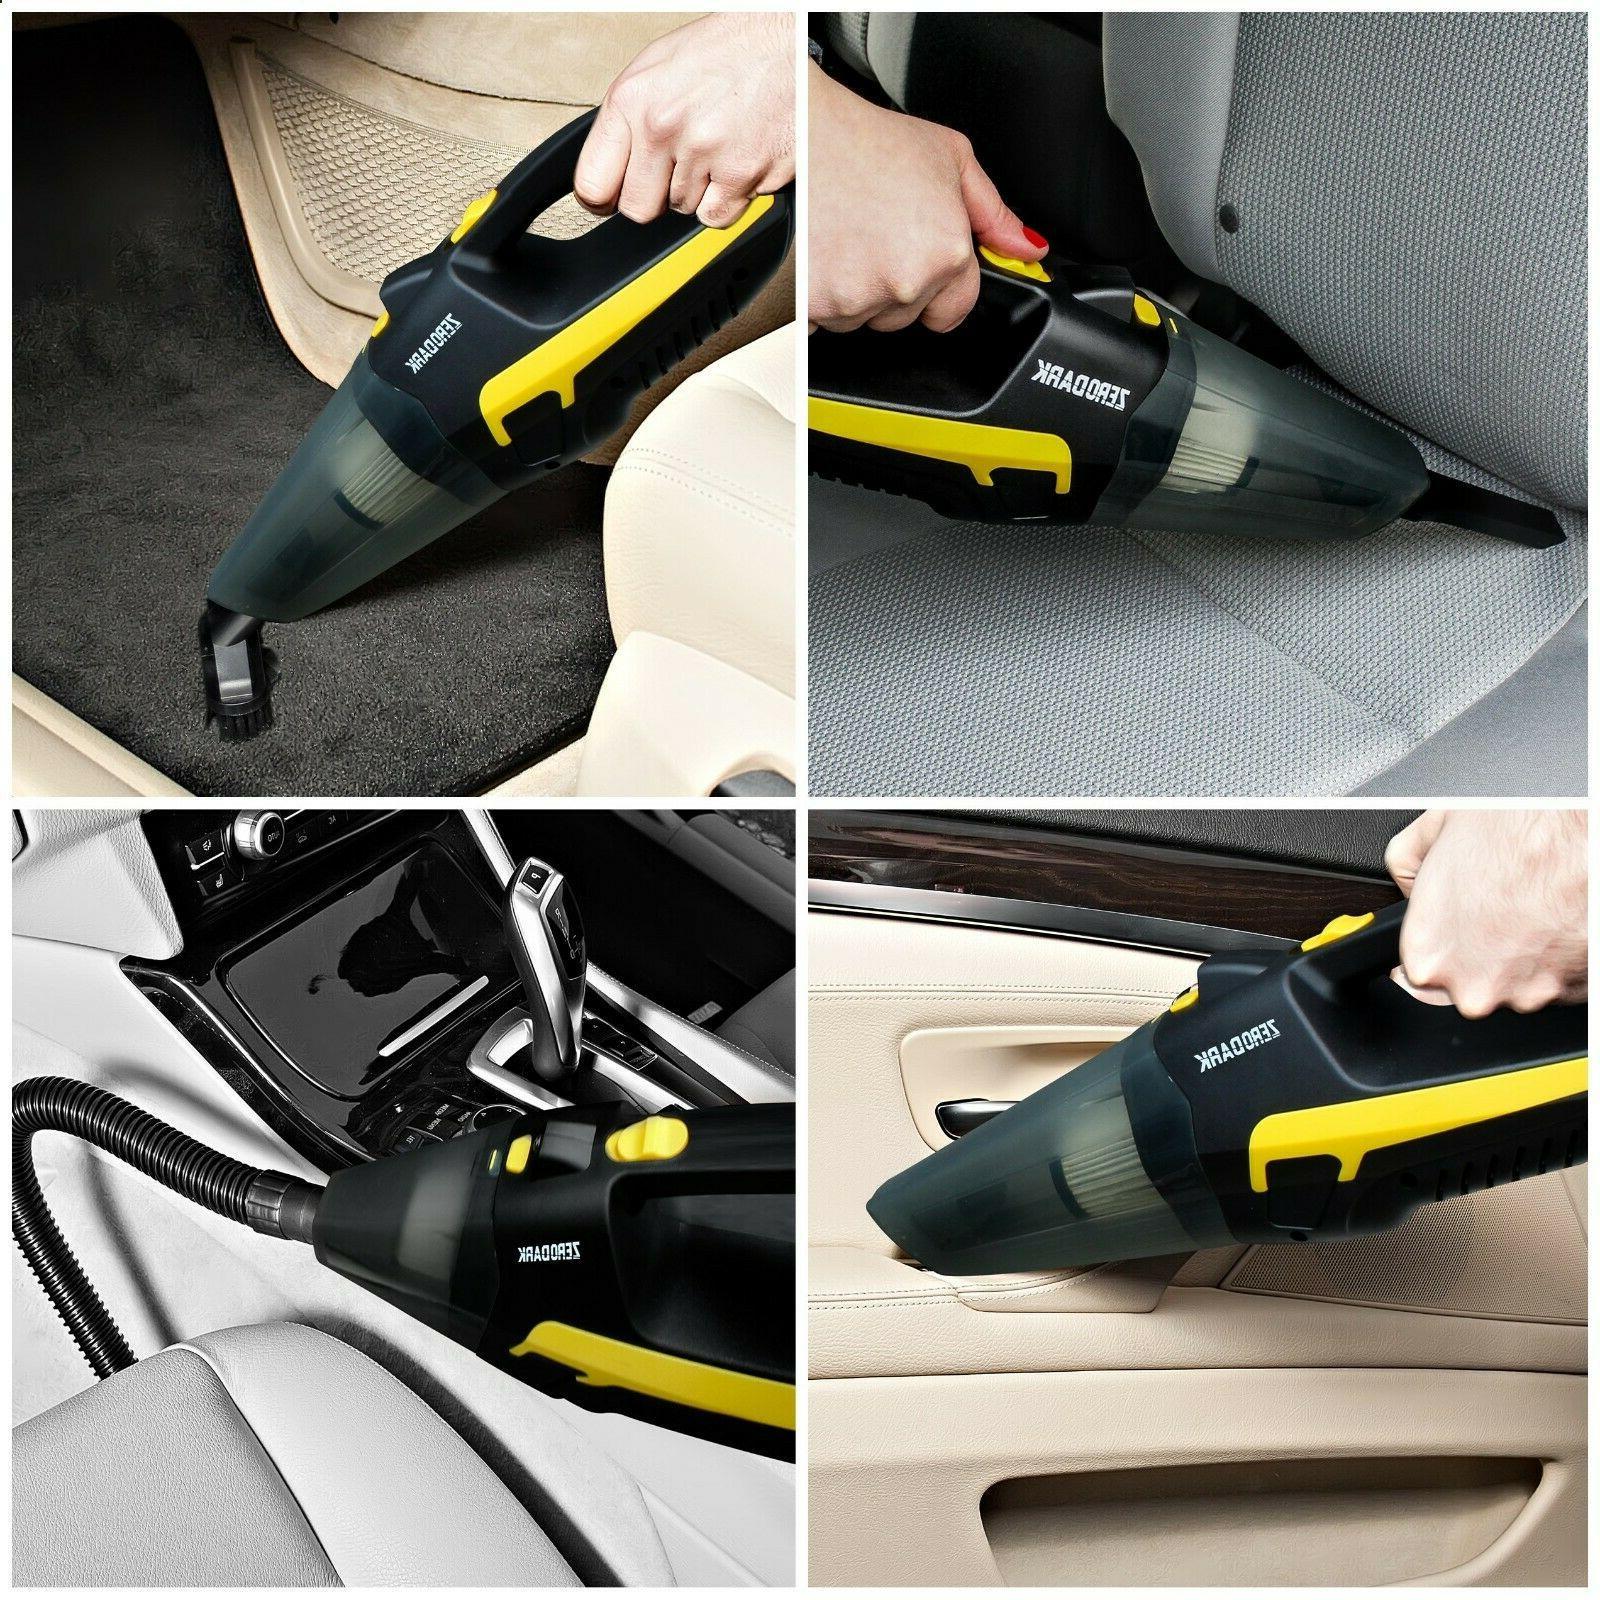 ZeroDark™ Wet/Dry Cleaner Inflator Hand Held For Car